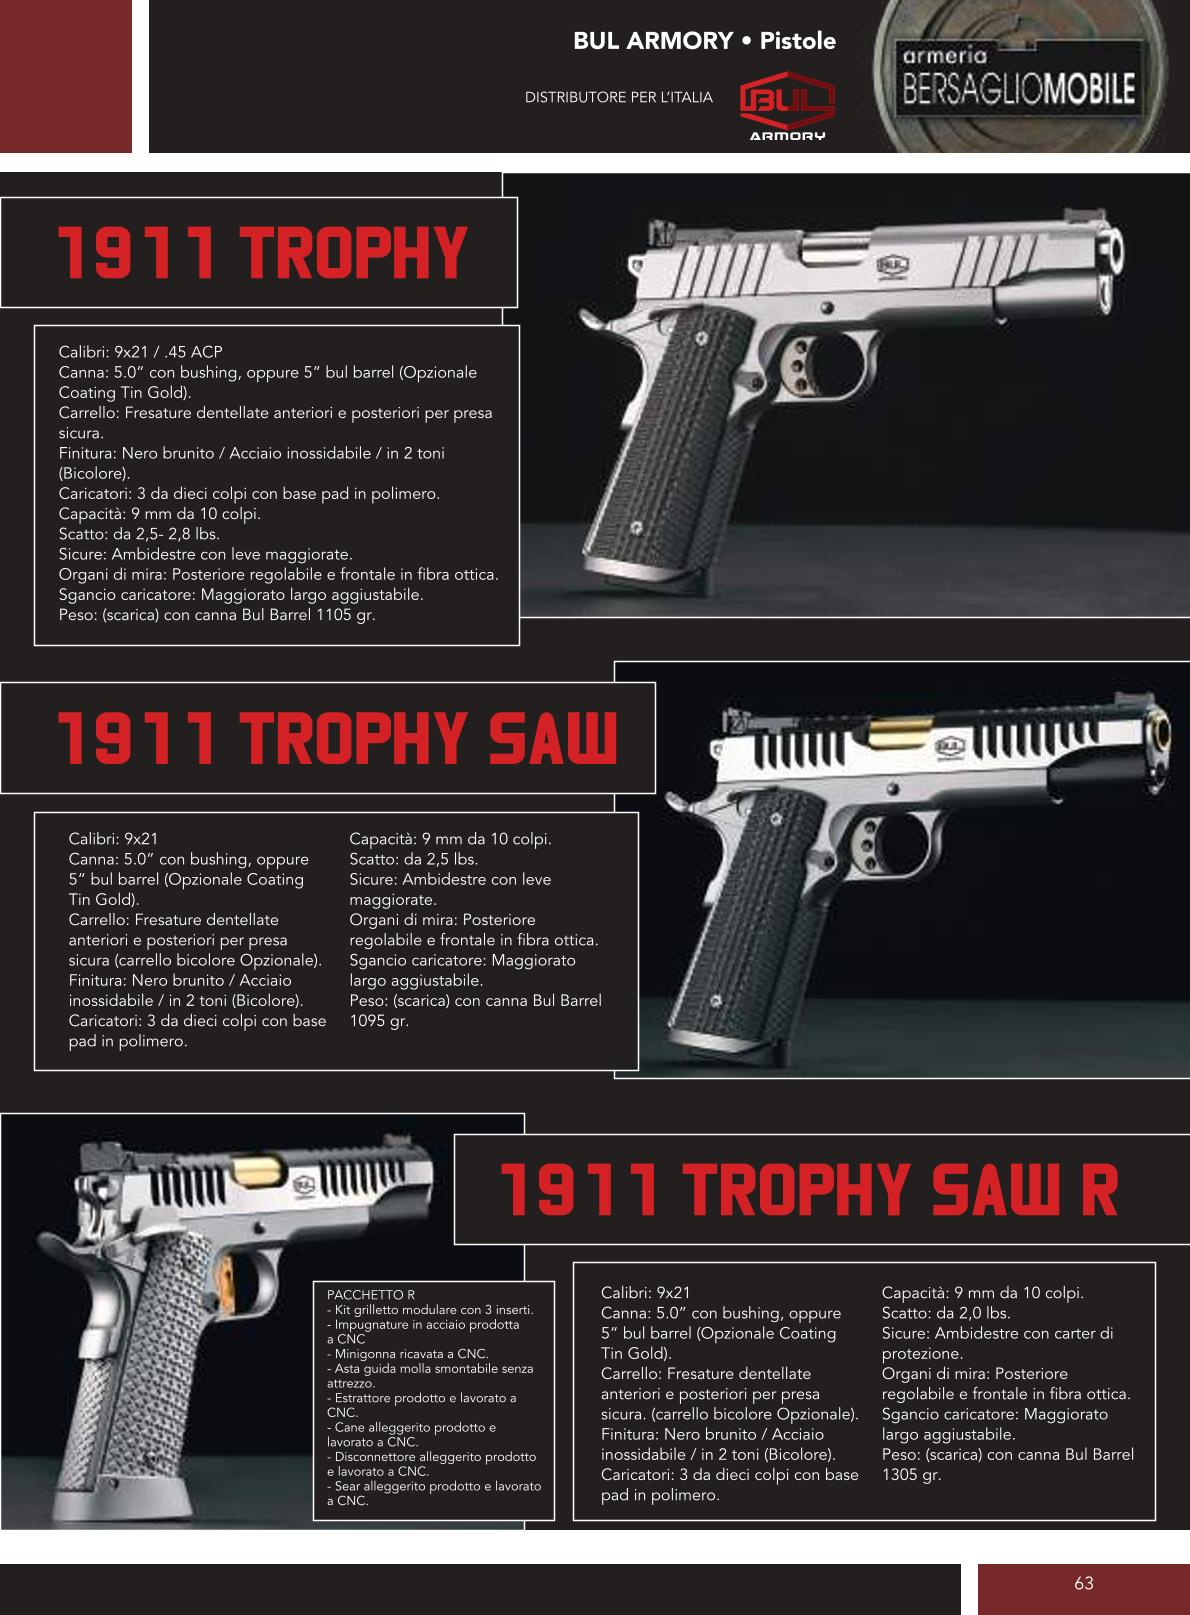 Bul Armory - 1911 Trophy - 1911 Trophy Saw - 1911 Trophy Saw R - Armeria Bersaglio Mobile